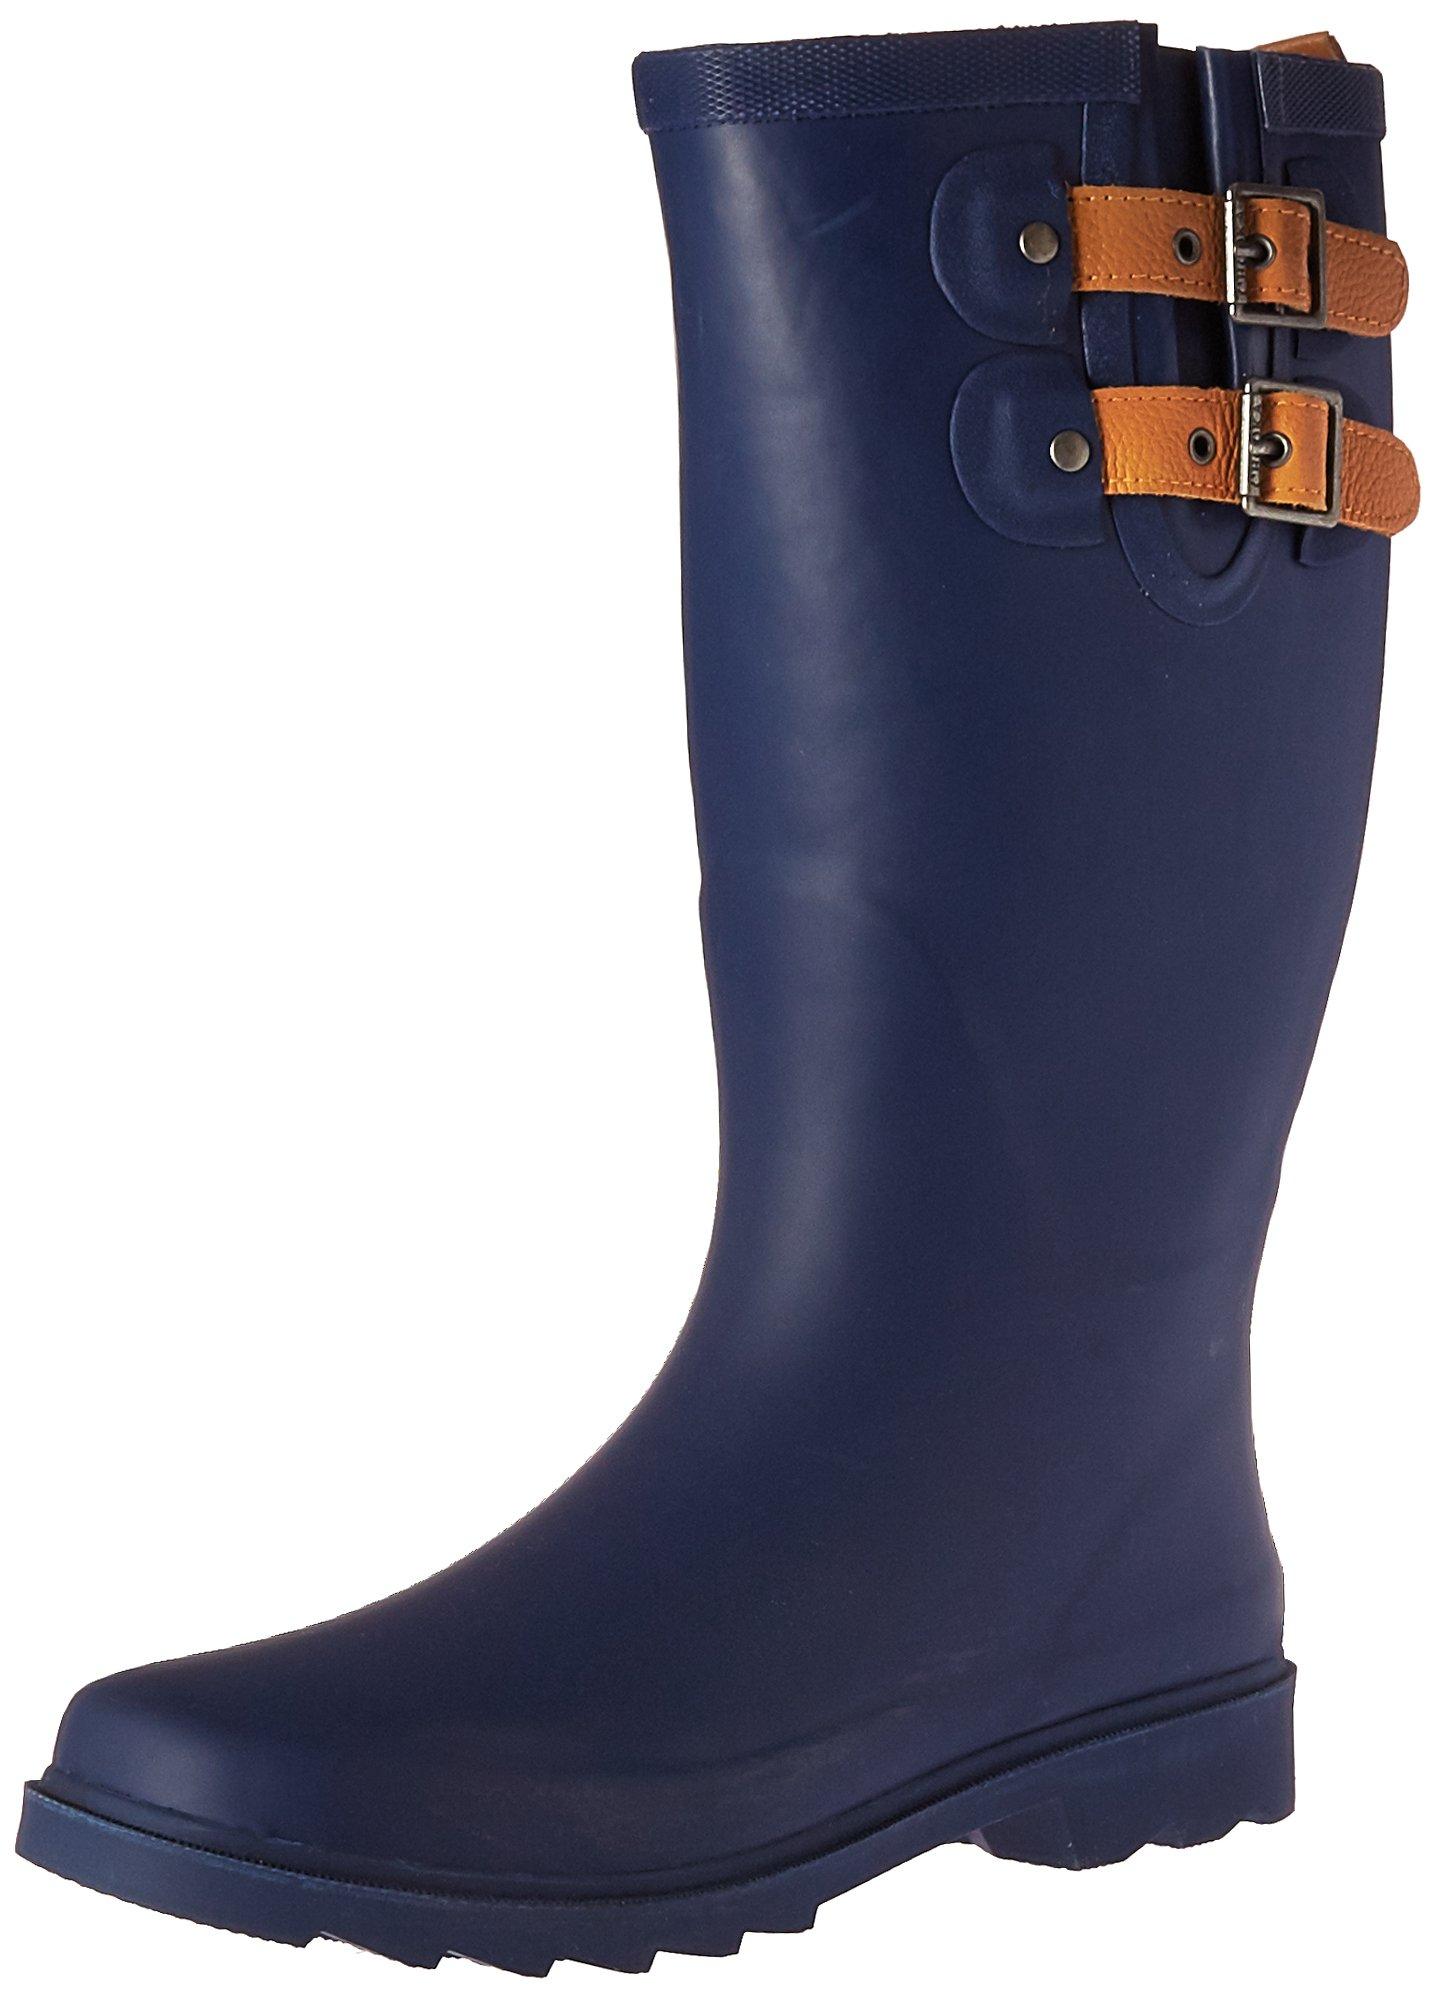 Chooka Women's Tall Rain Boot, Deep Navy, 9 M US